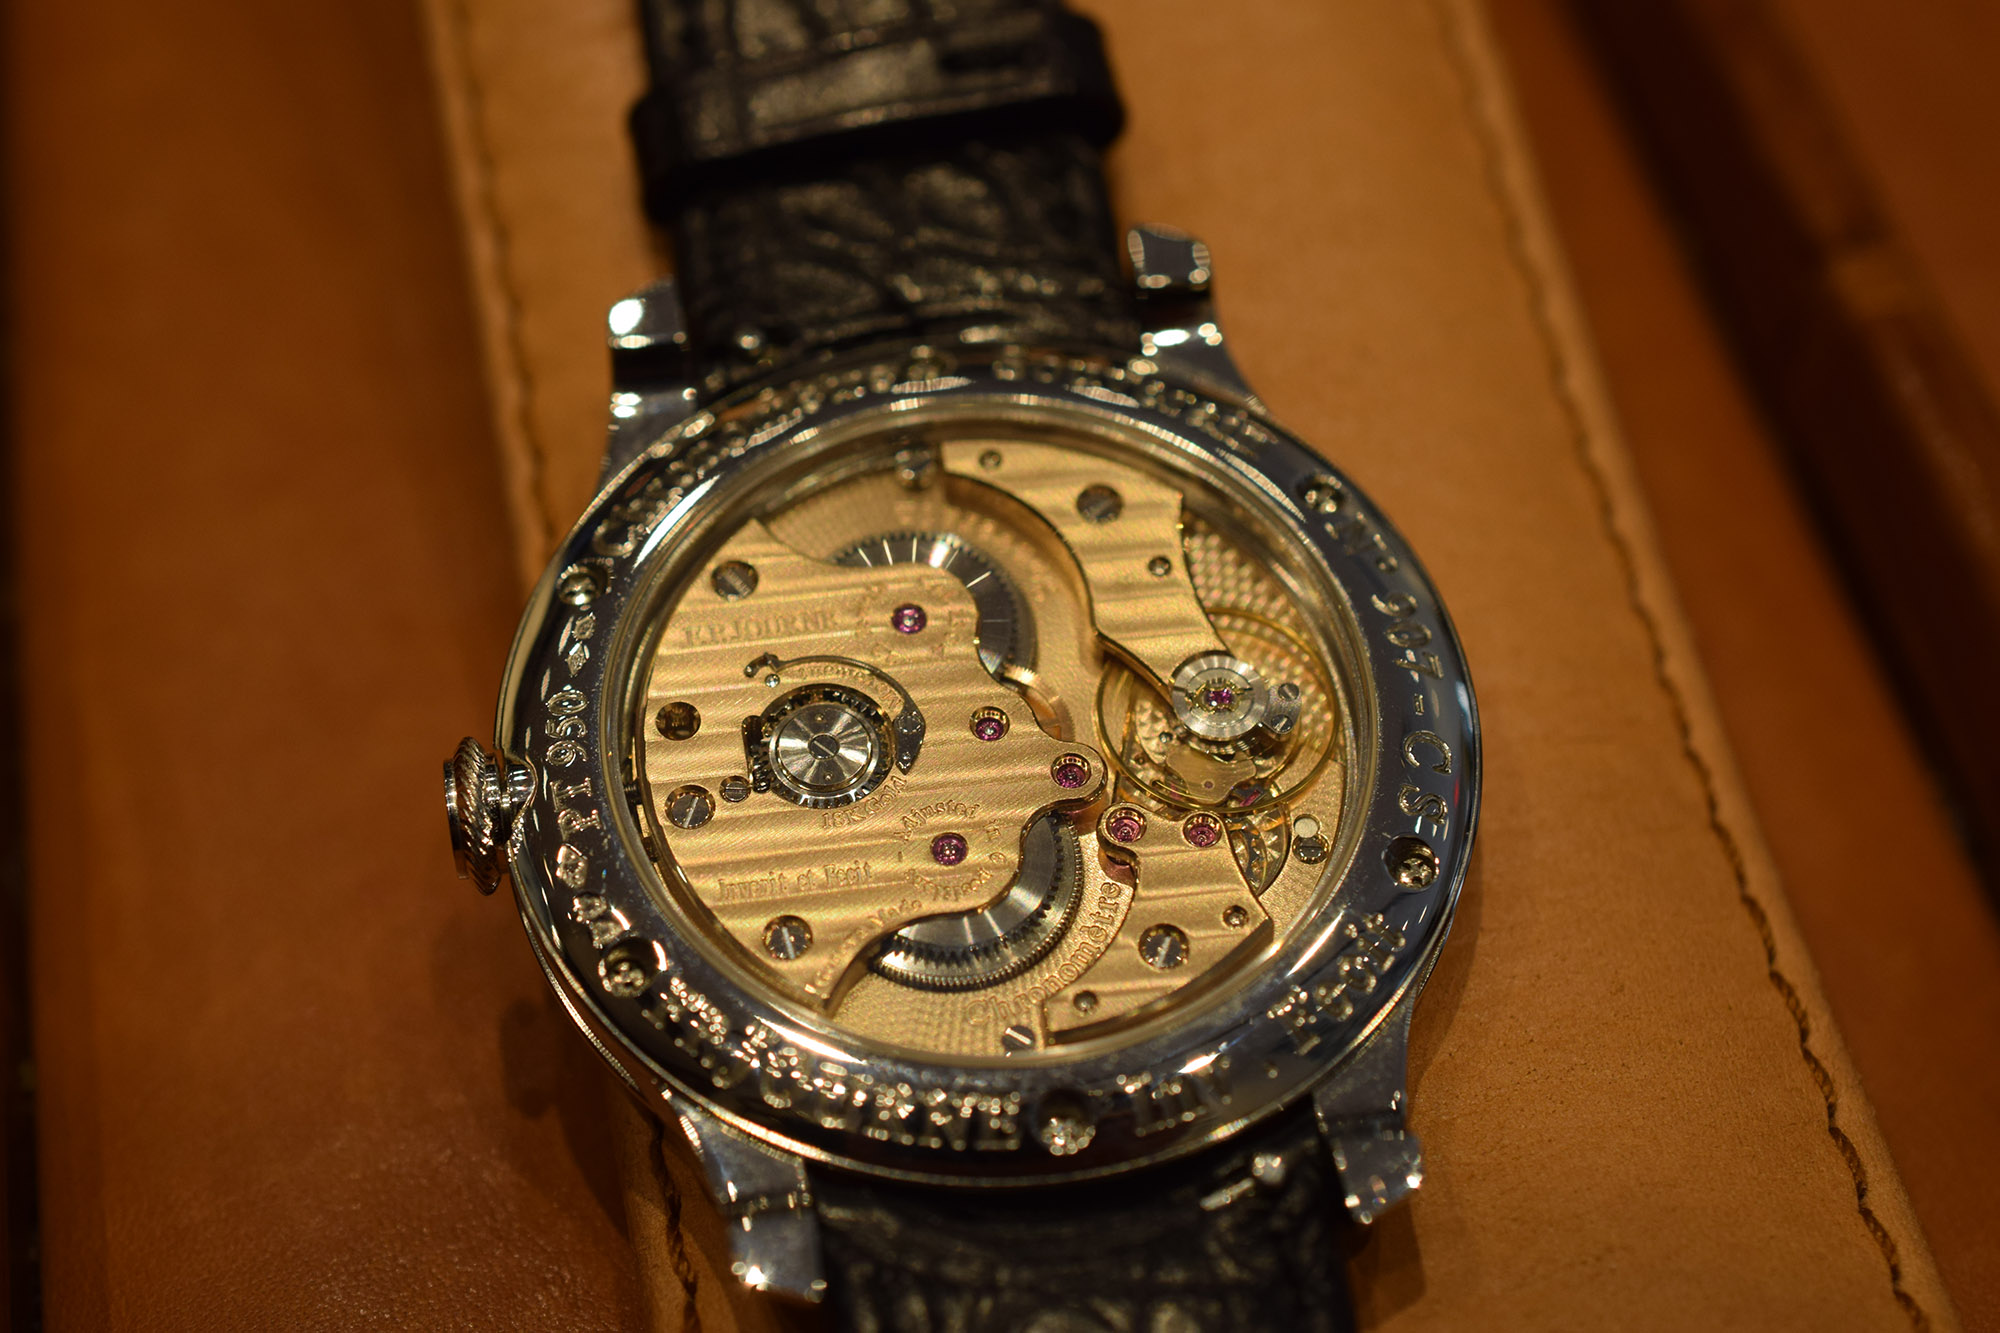 F.P. Journe Chronometre Souverain - Caseback